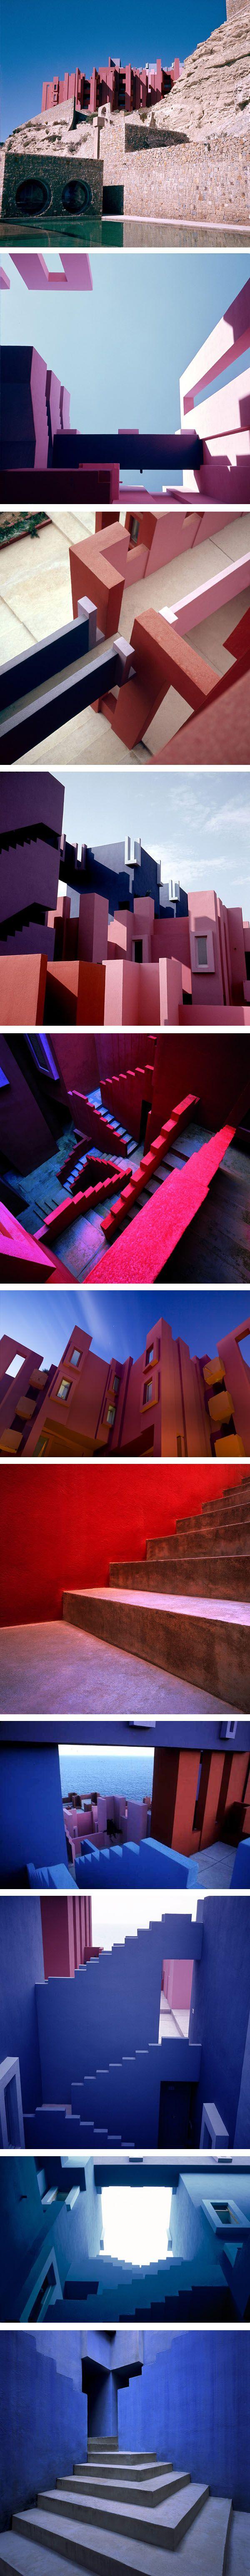 La Muralla Roja (Red Wall). Housing Project in Calpe, Spain. Spanish architect Richardo Bofil.1968